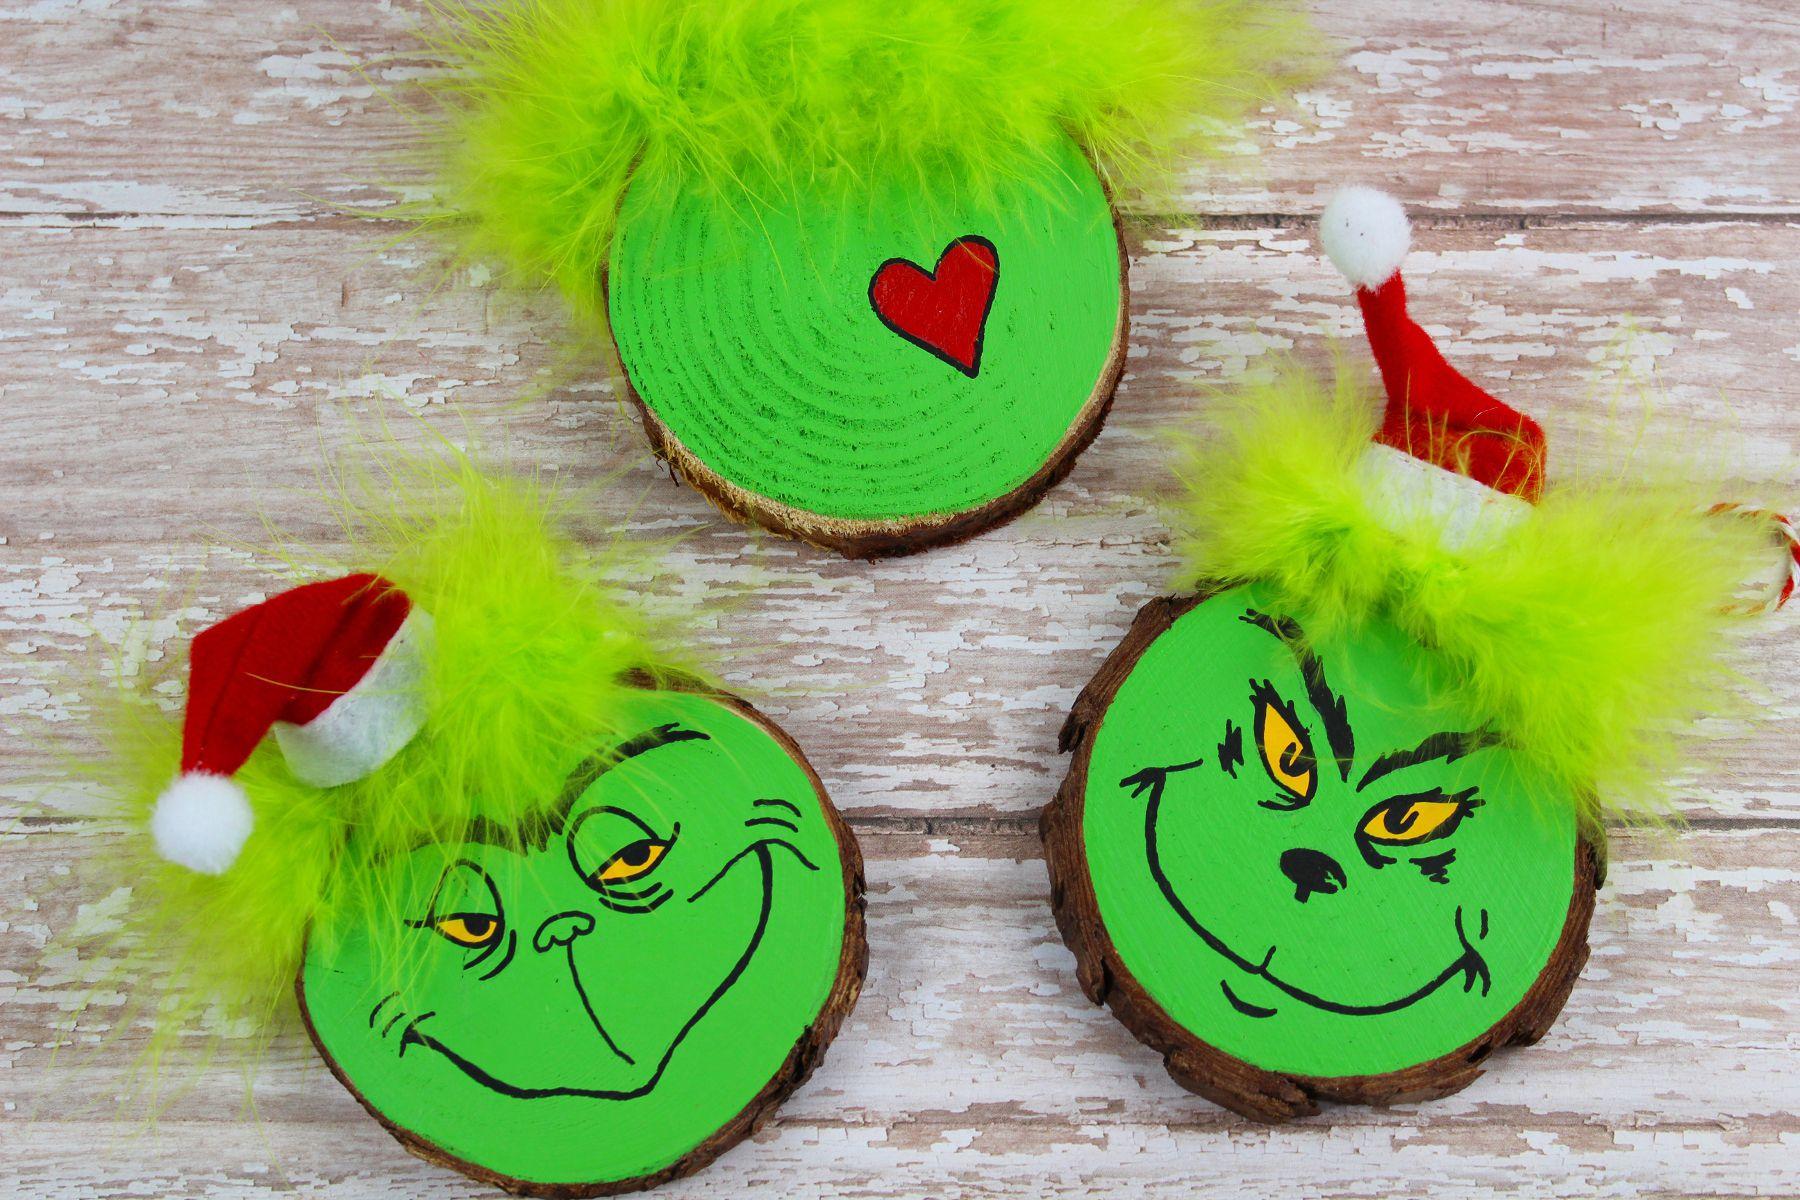 Wood Slice Grinch Christmas Tree Ornament Craft Recipe In 2020 Christmas Tree Ornament Crafts Grinch Christmas Tree Wooden Christmas Ornaments